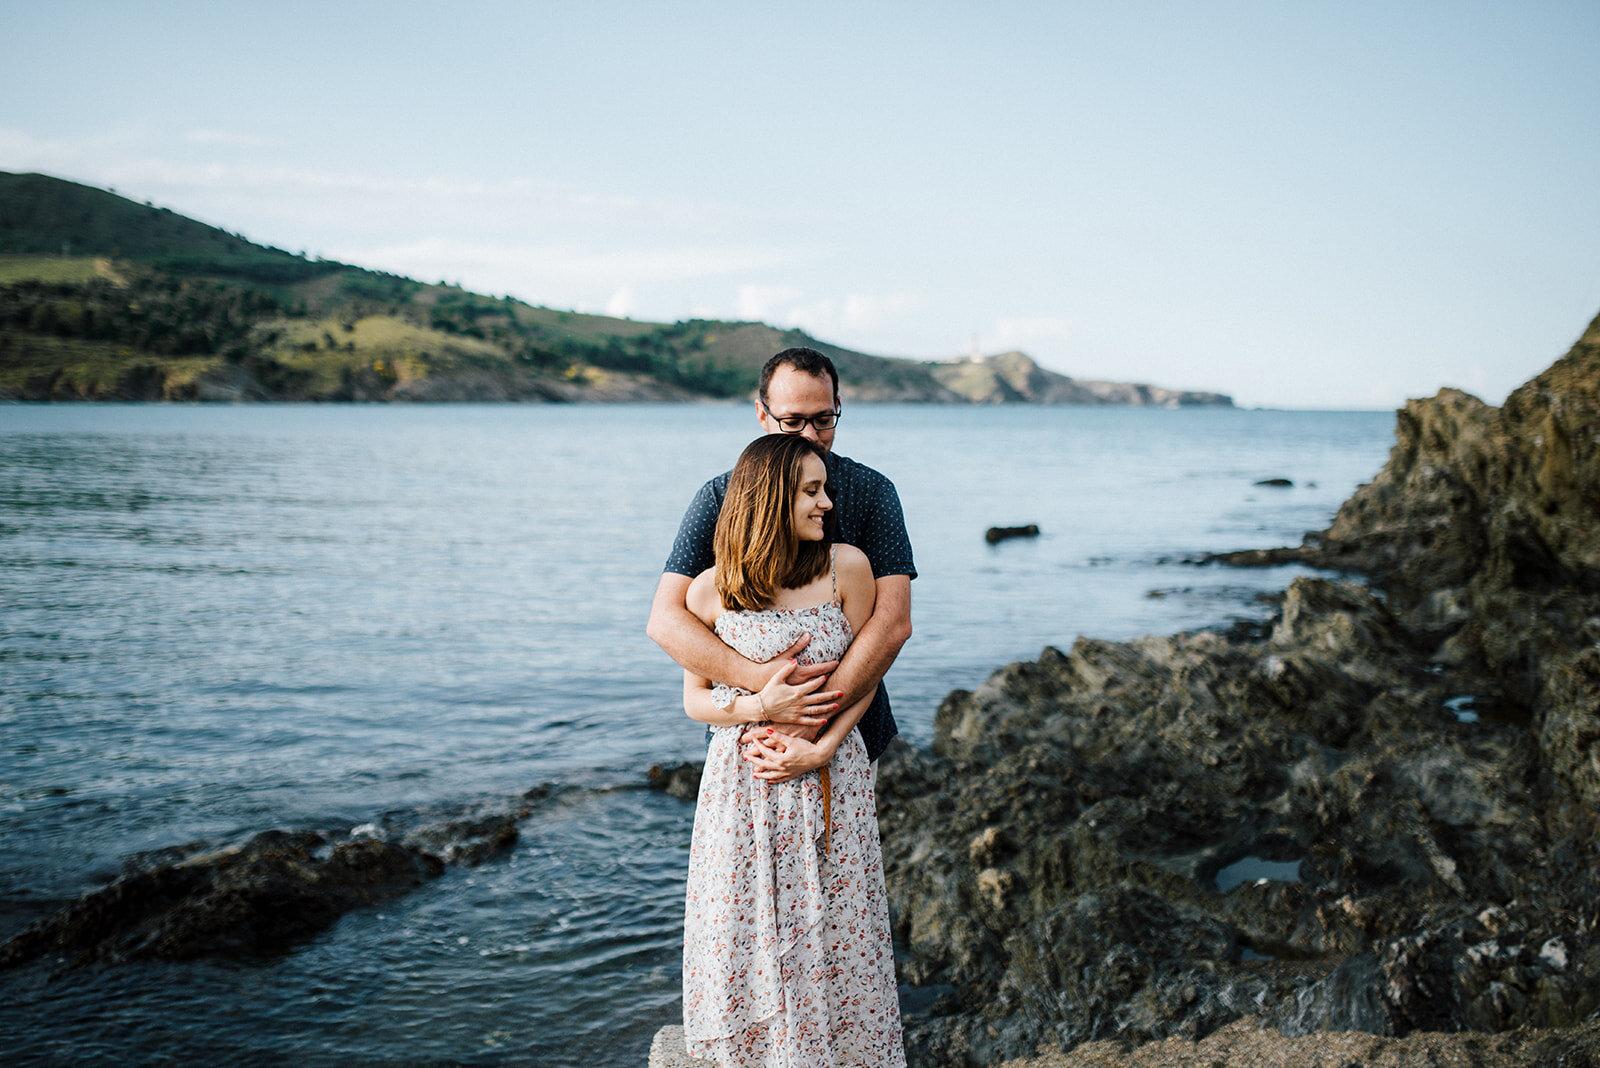 Photographe Mariage et couple Perpignan16.jpg